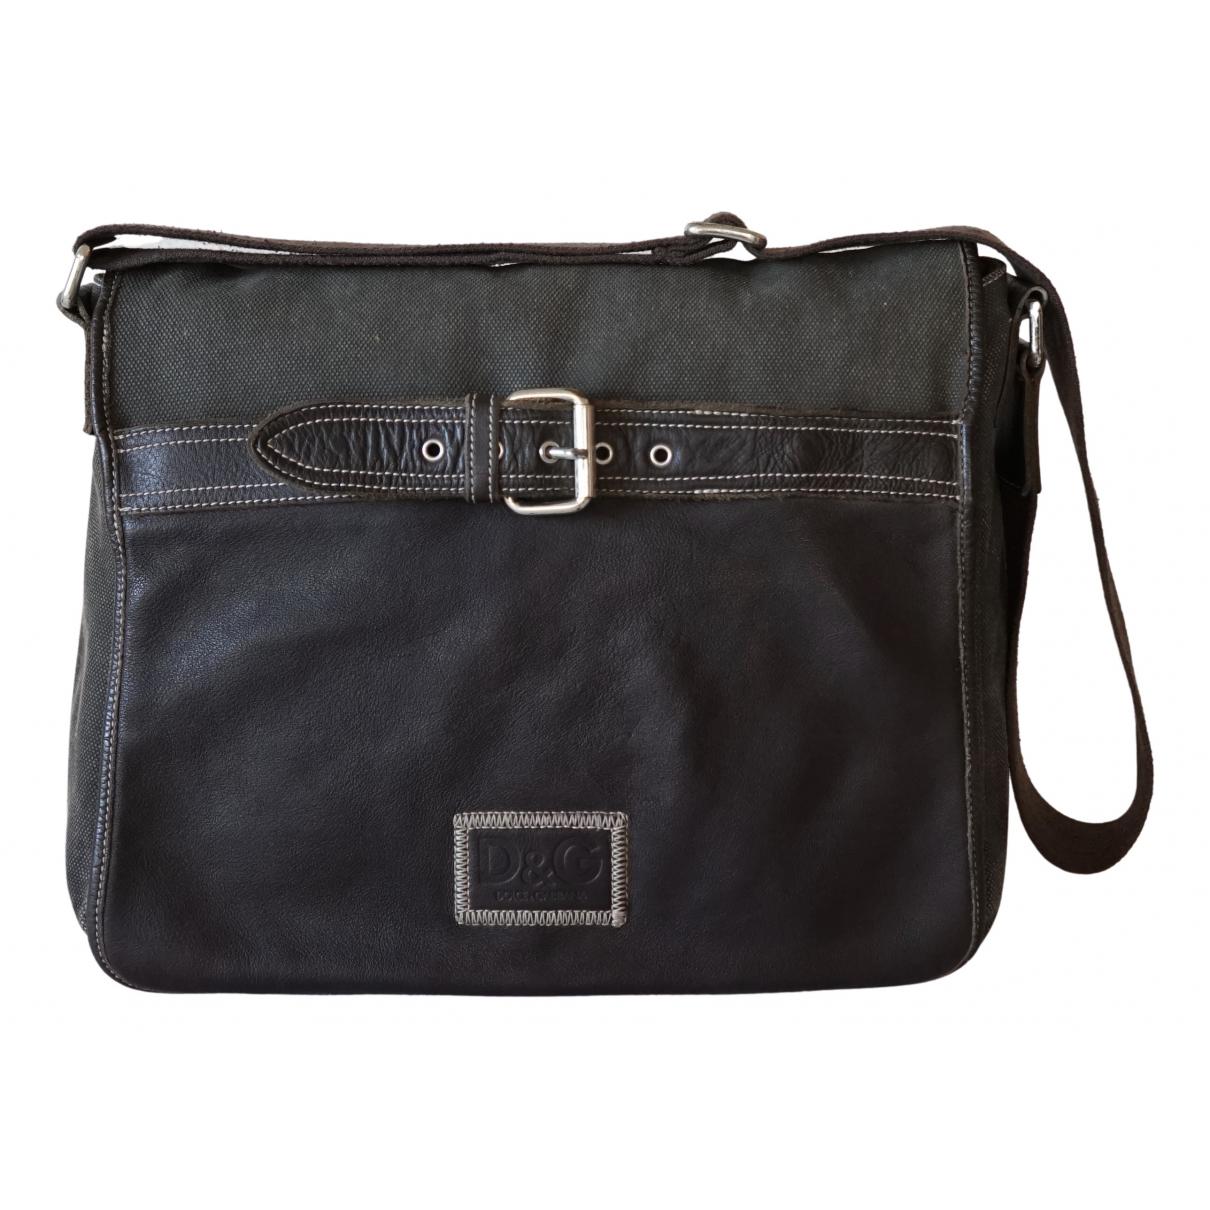 D&g \N Brown Cloth bag for Men \N